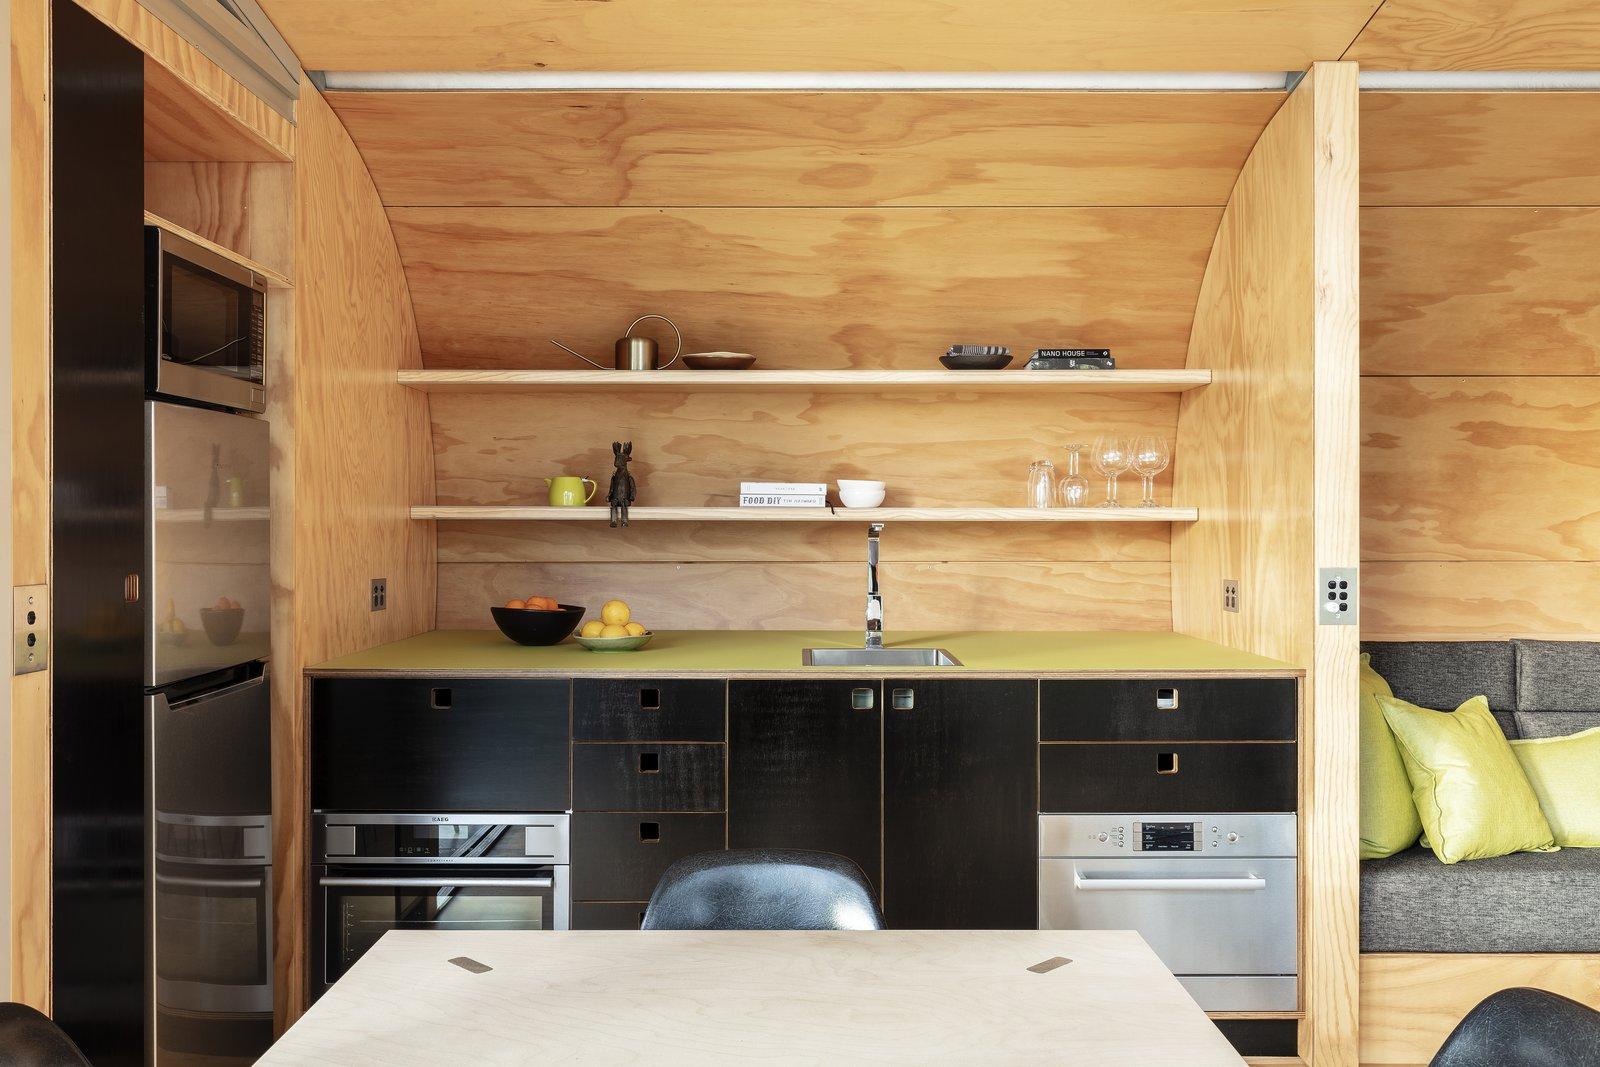 Fabshack prefab cabin kitchen